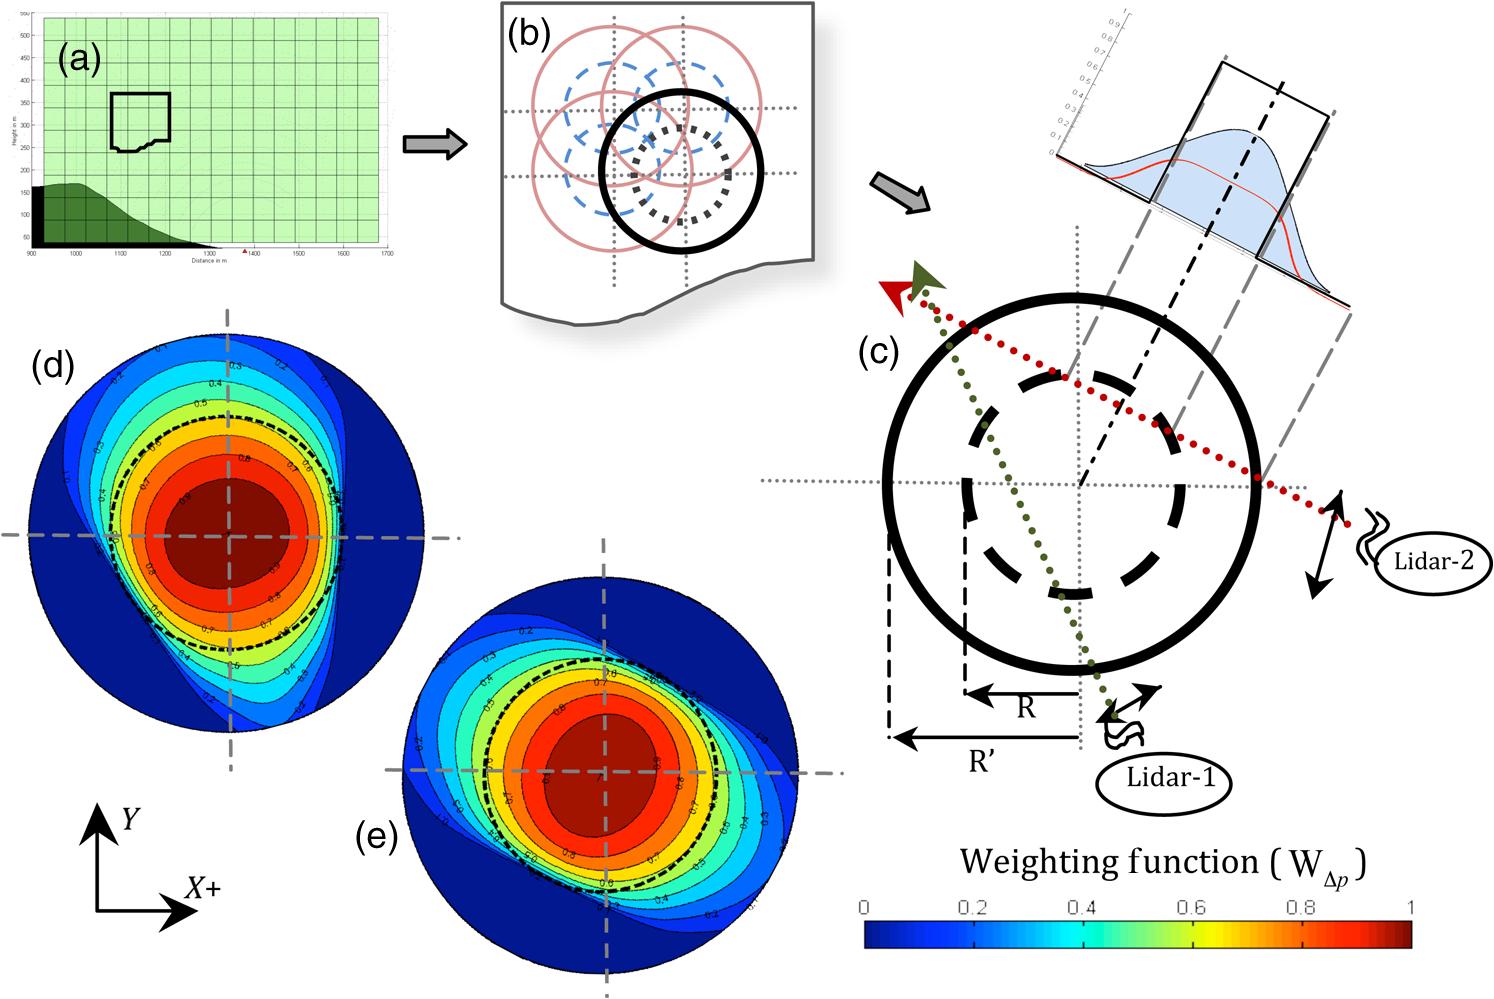 Instrument configuration for dual-Doppler lidar coplanar scans